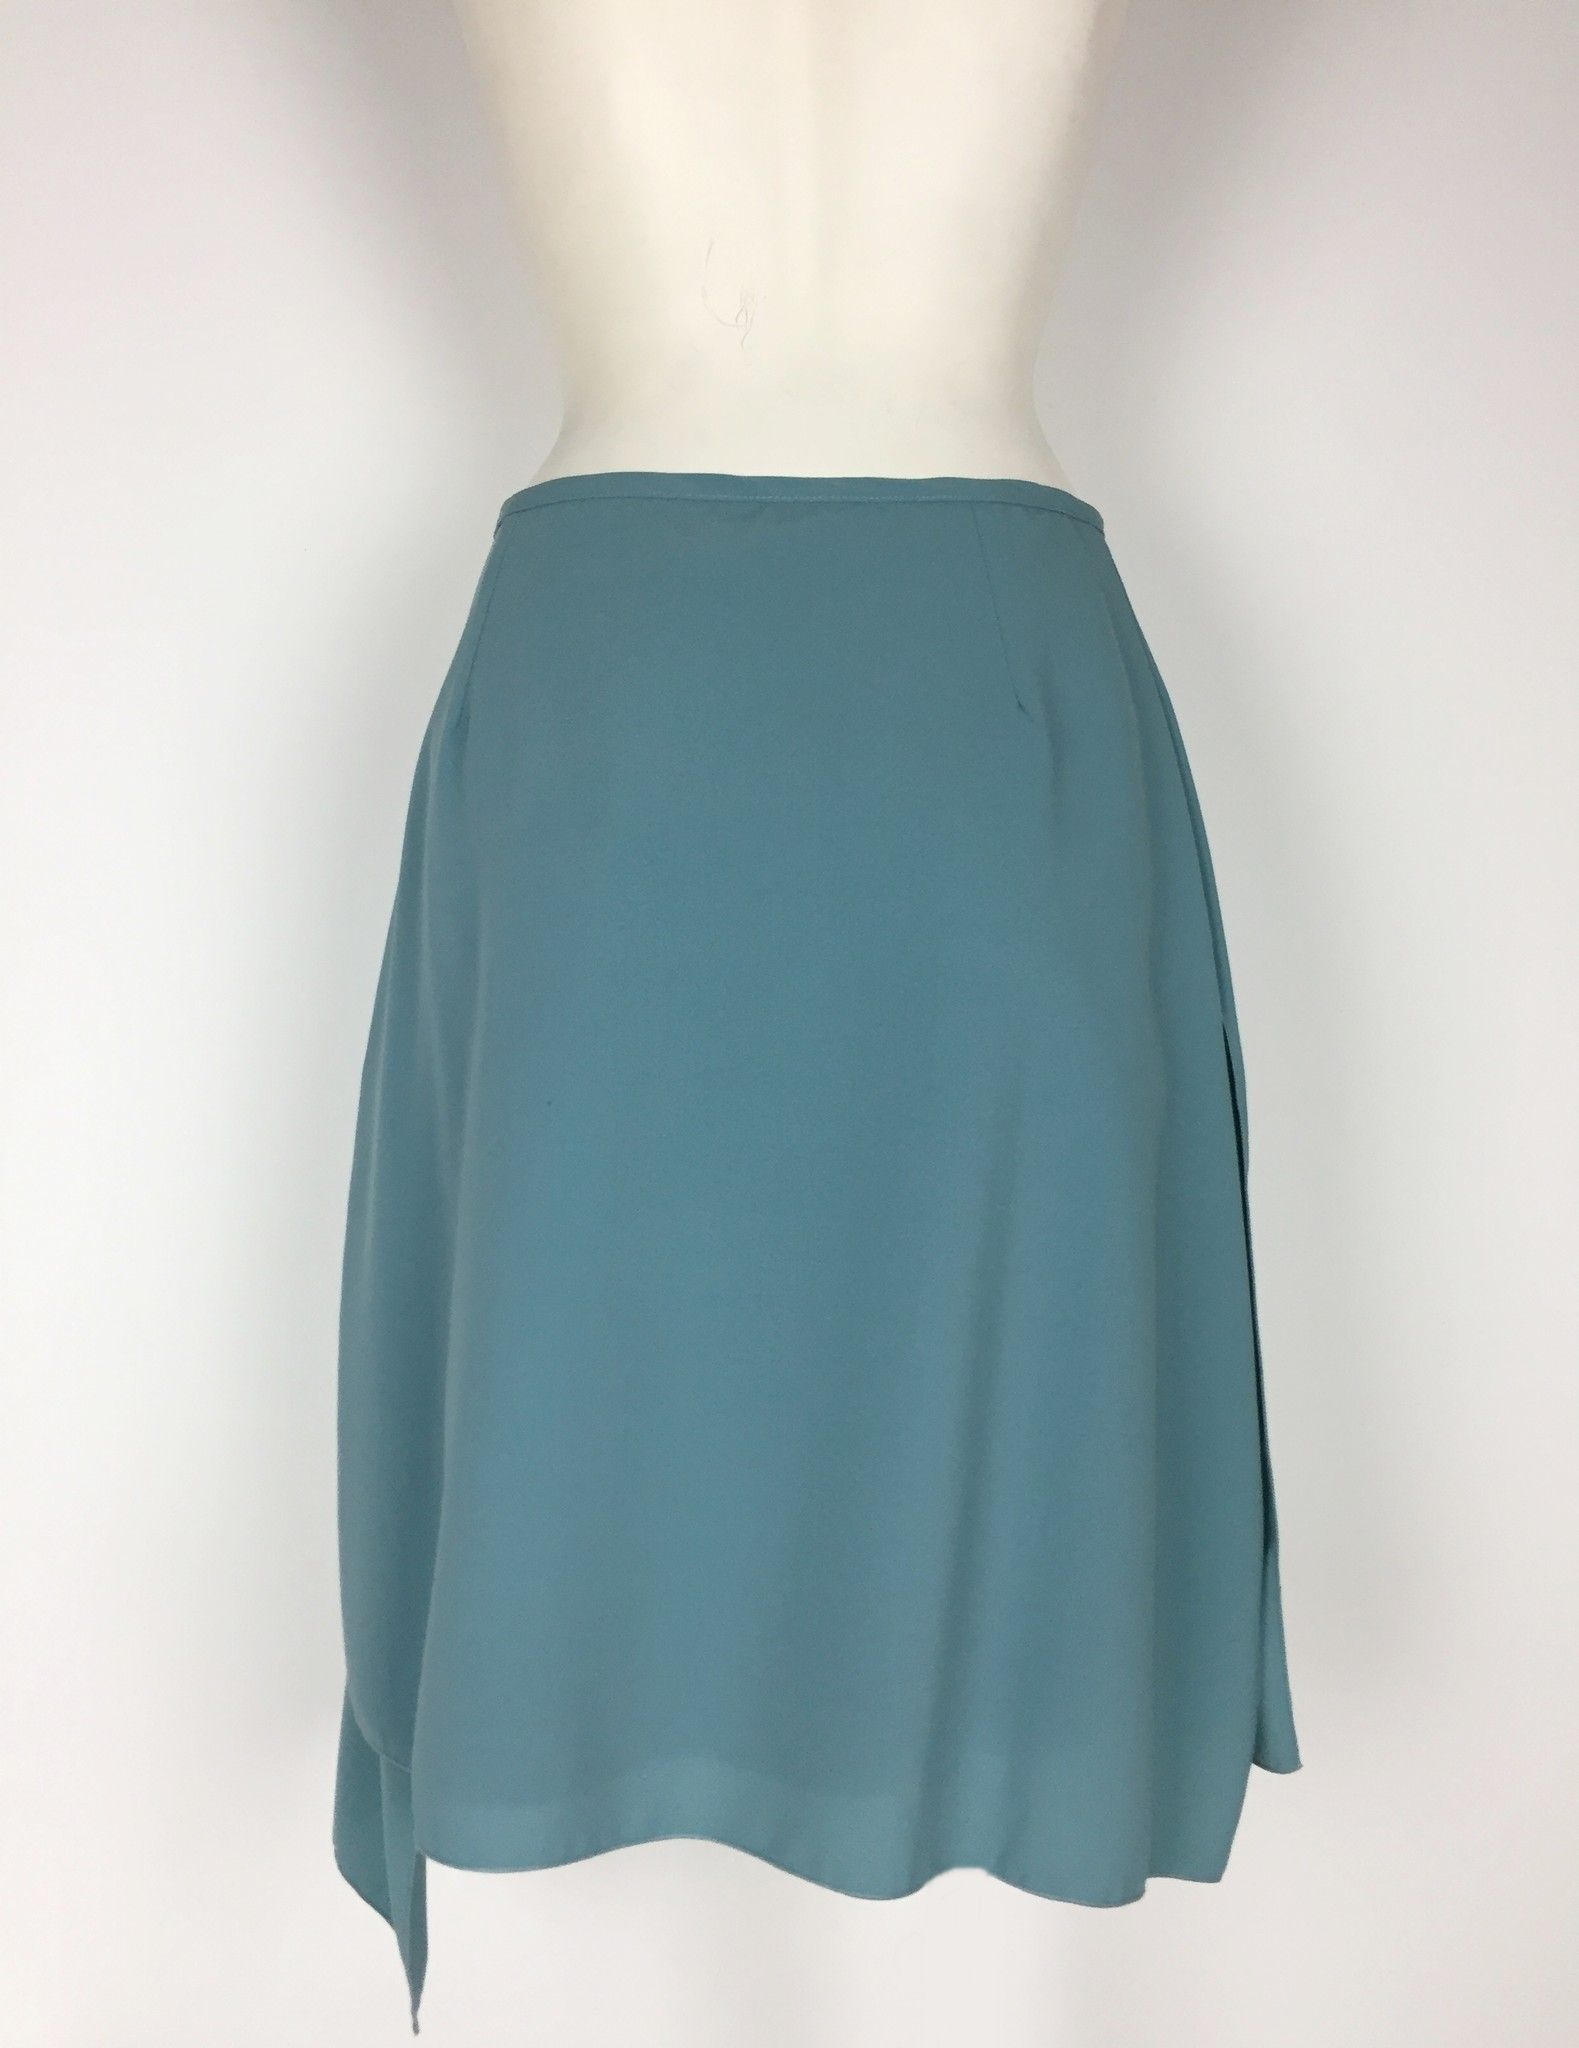 Adele Fado Double Veils Skirt Cod.67222